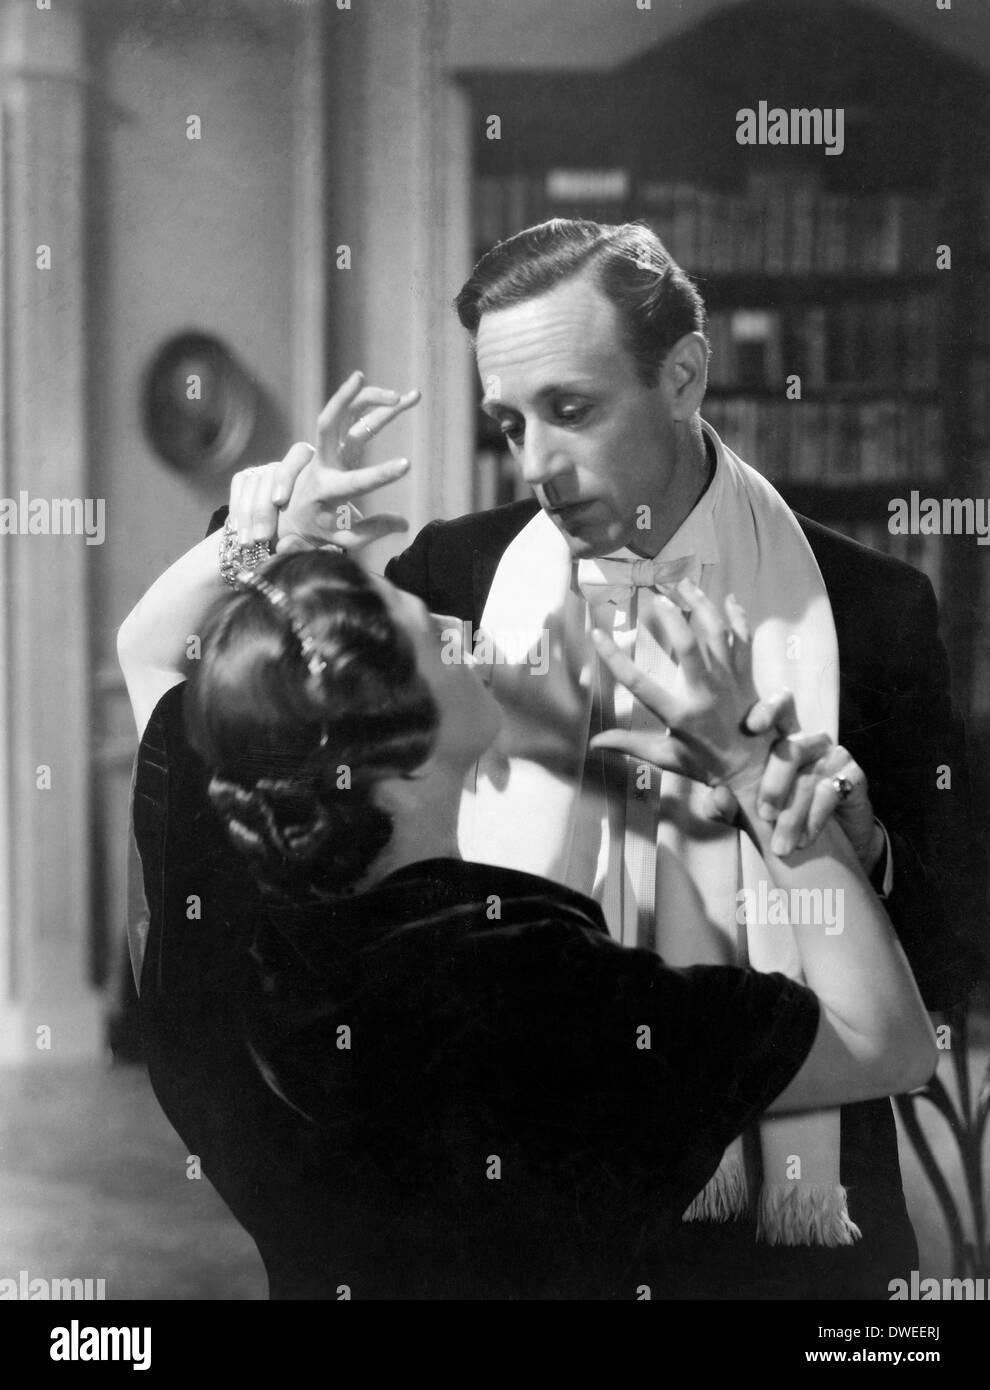 Wendy Hiller and Leslie Howard, on-set of the Film, 'Pygmalion', 1938 - Stock Image